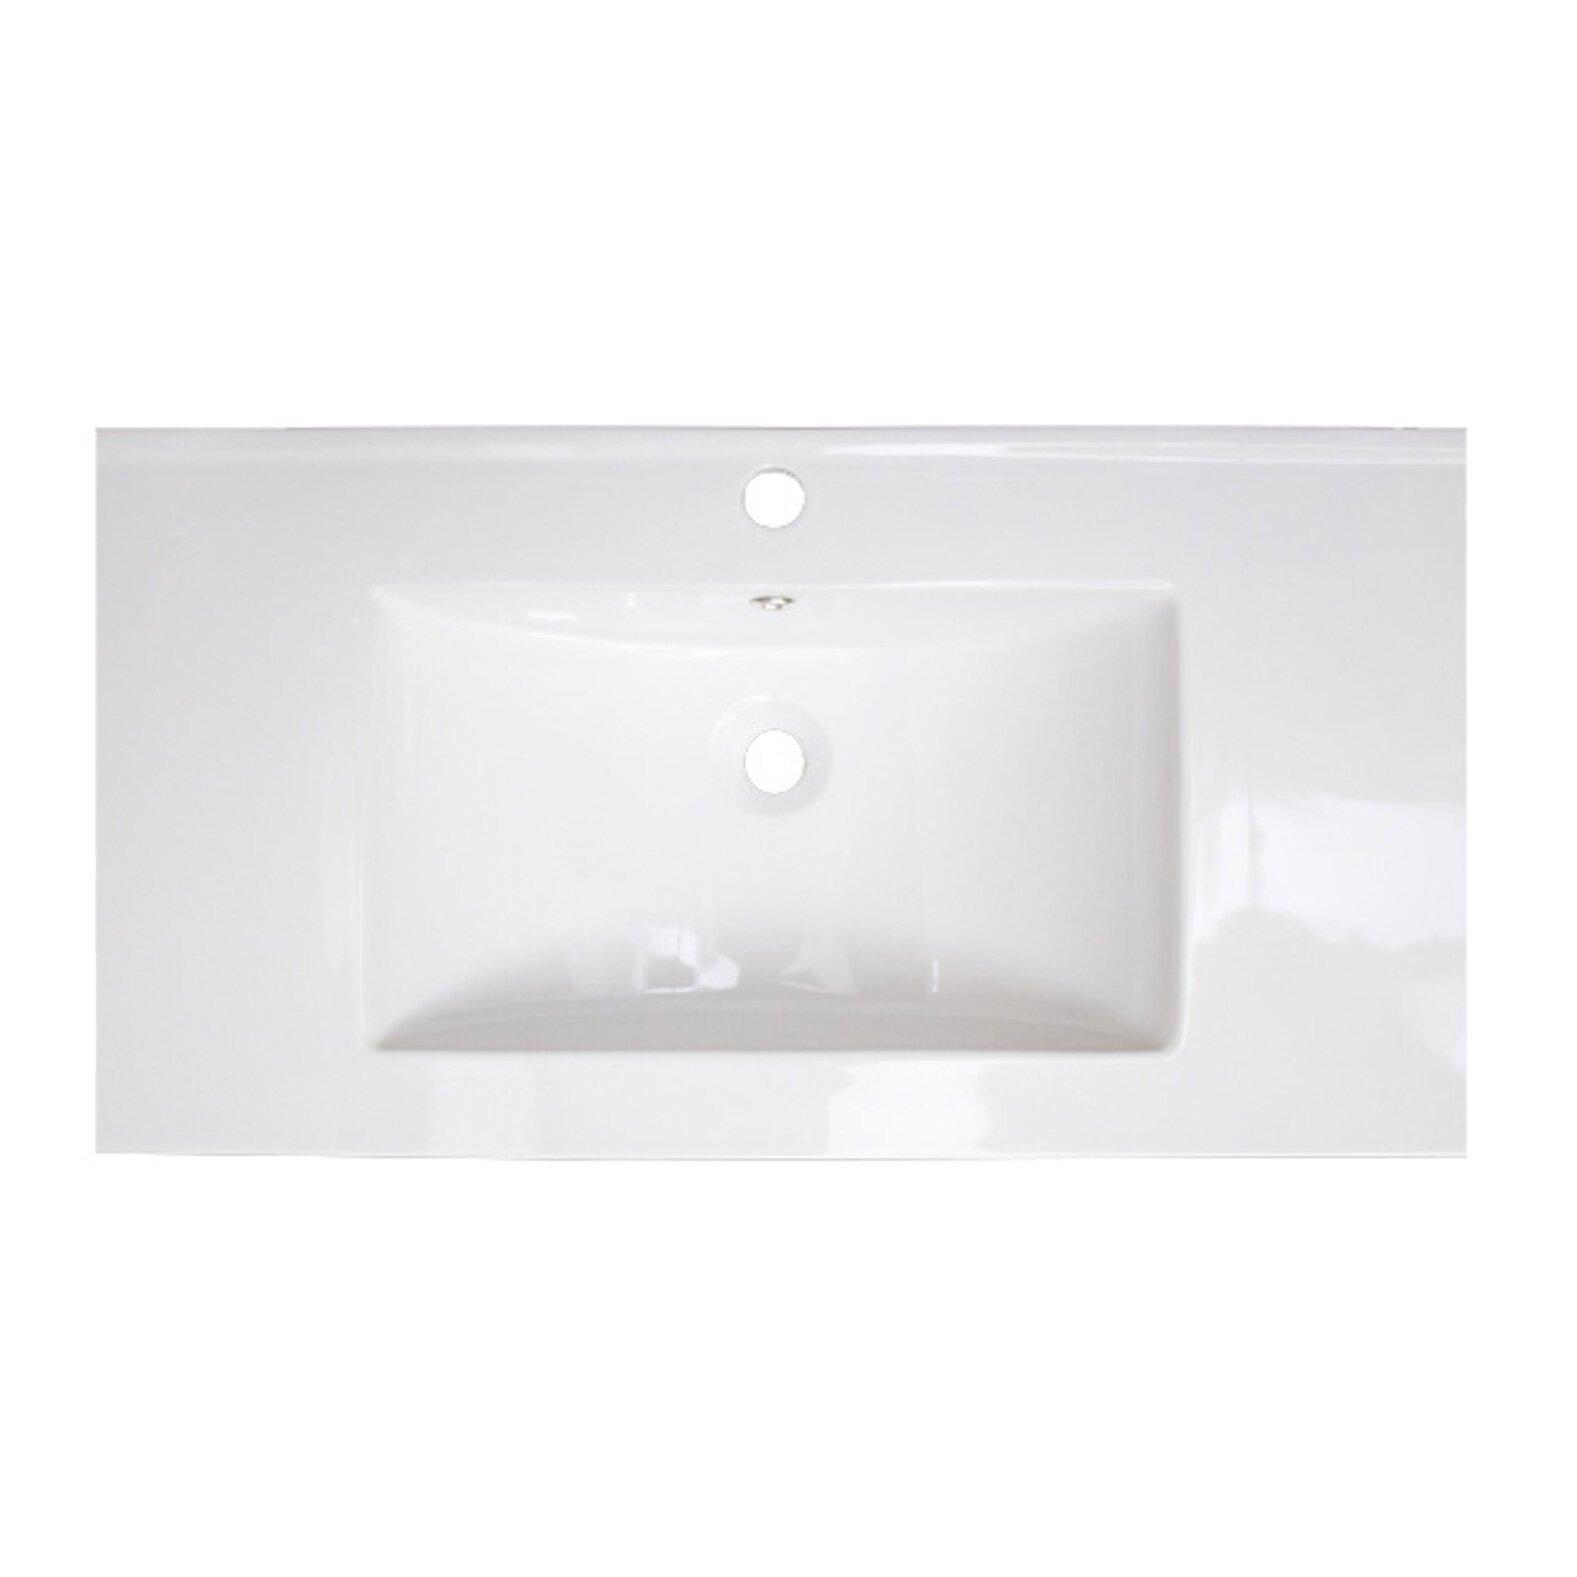 "American Imaginations 37"" Ceramic Bathroom Vanity Top"